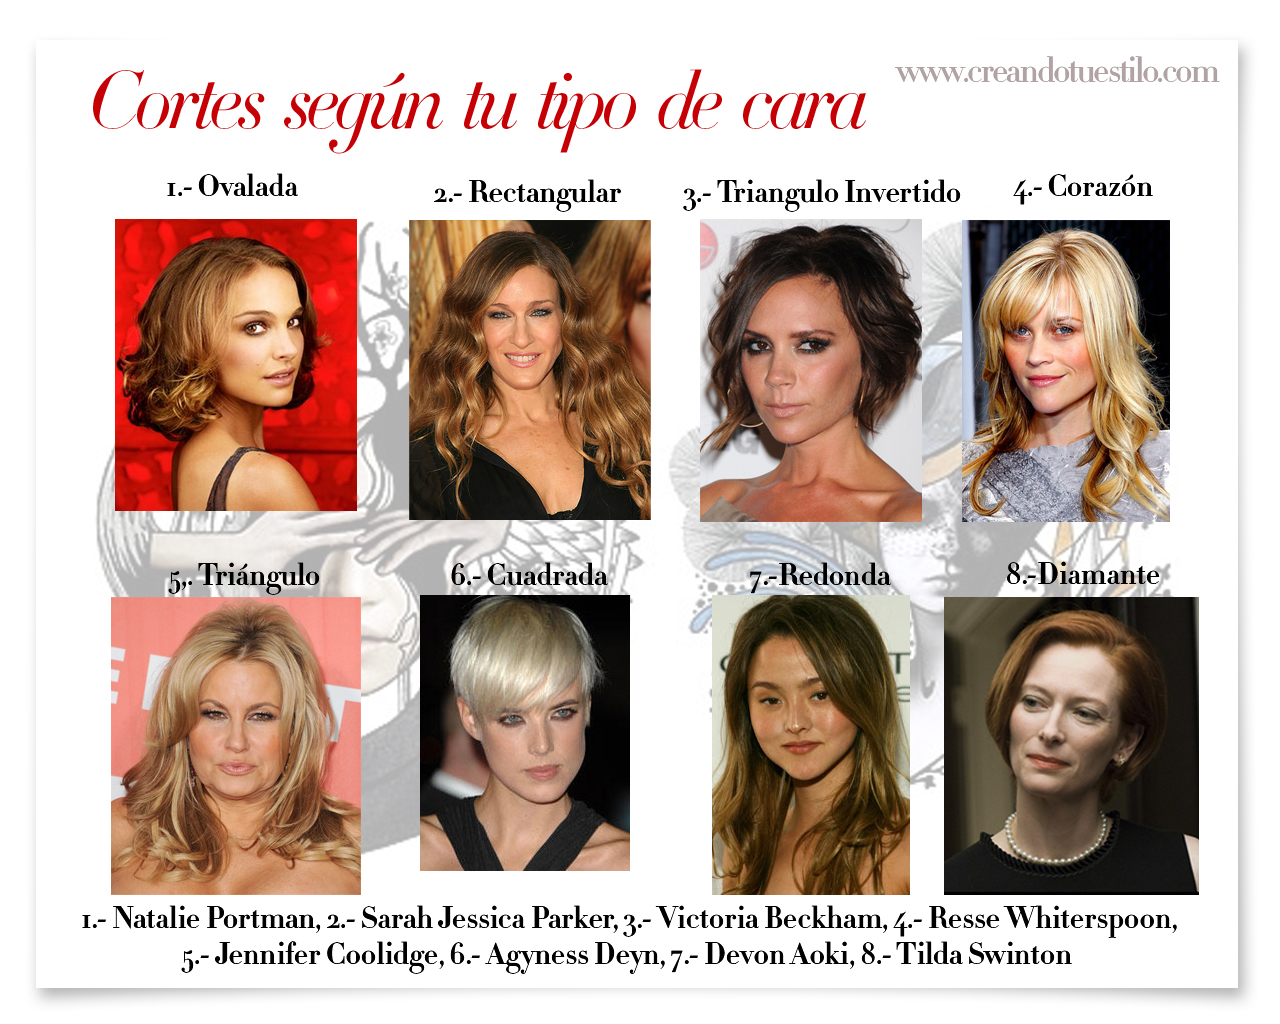 Peinados Para Rostro Corazon - 37 Cortes y Peinados para Cara Redonda que Adelgazan Mujeres